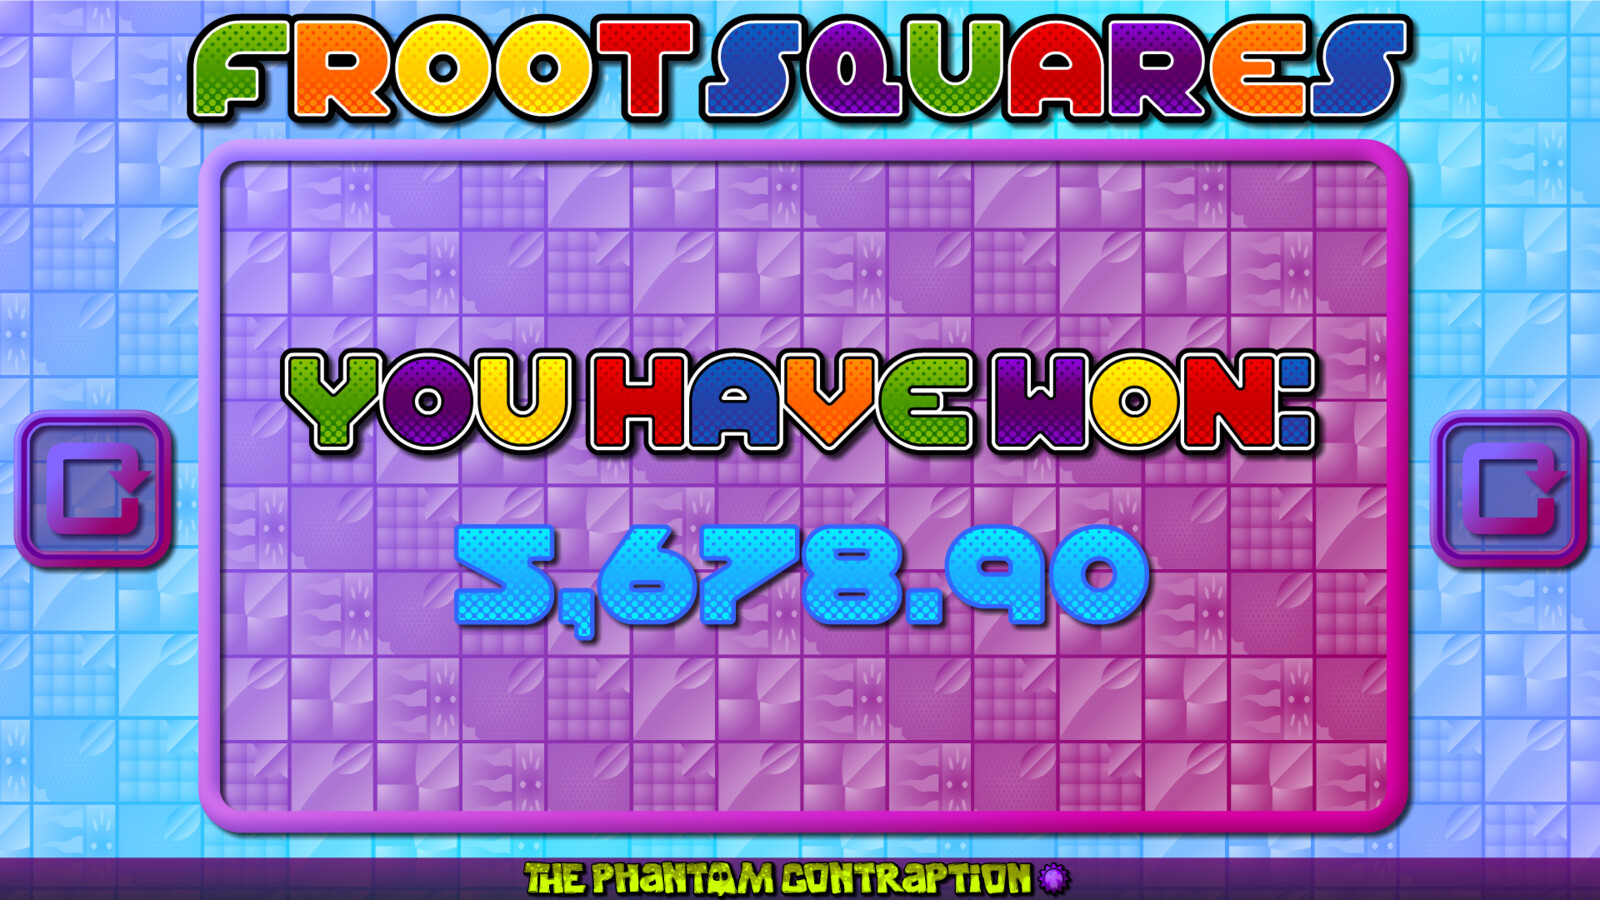 Froot Squares Landscape Screenshot: You Have Won